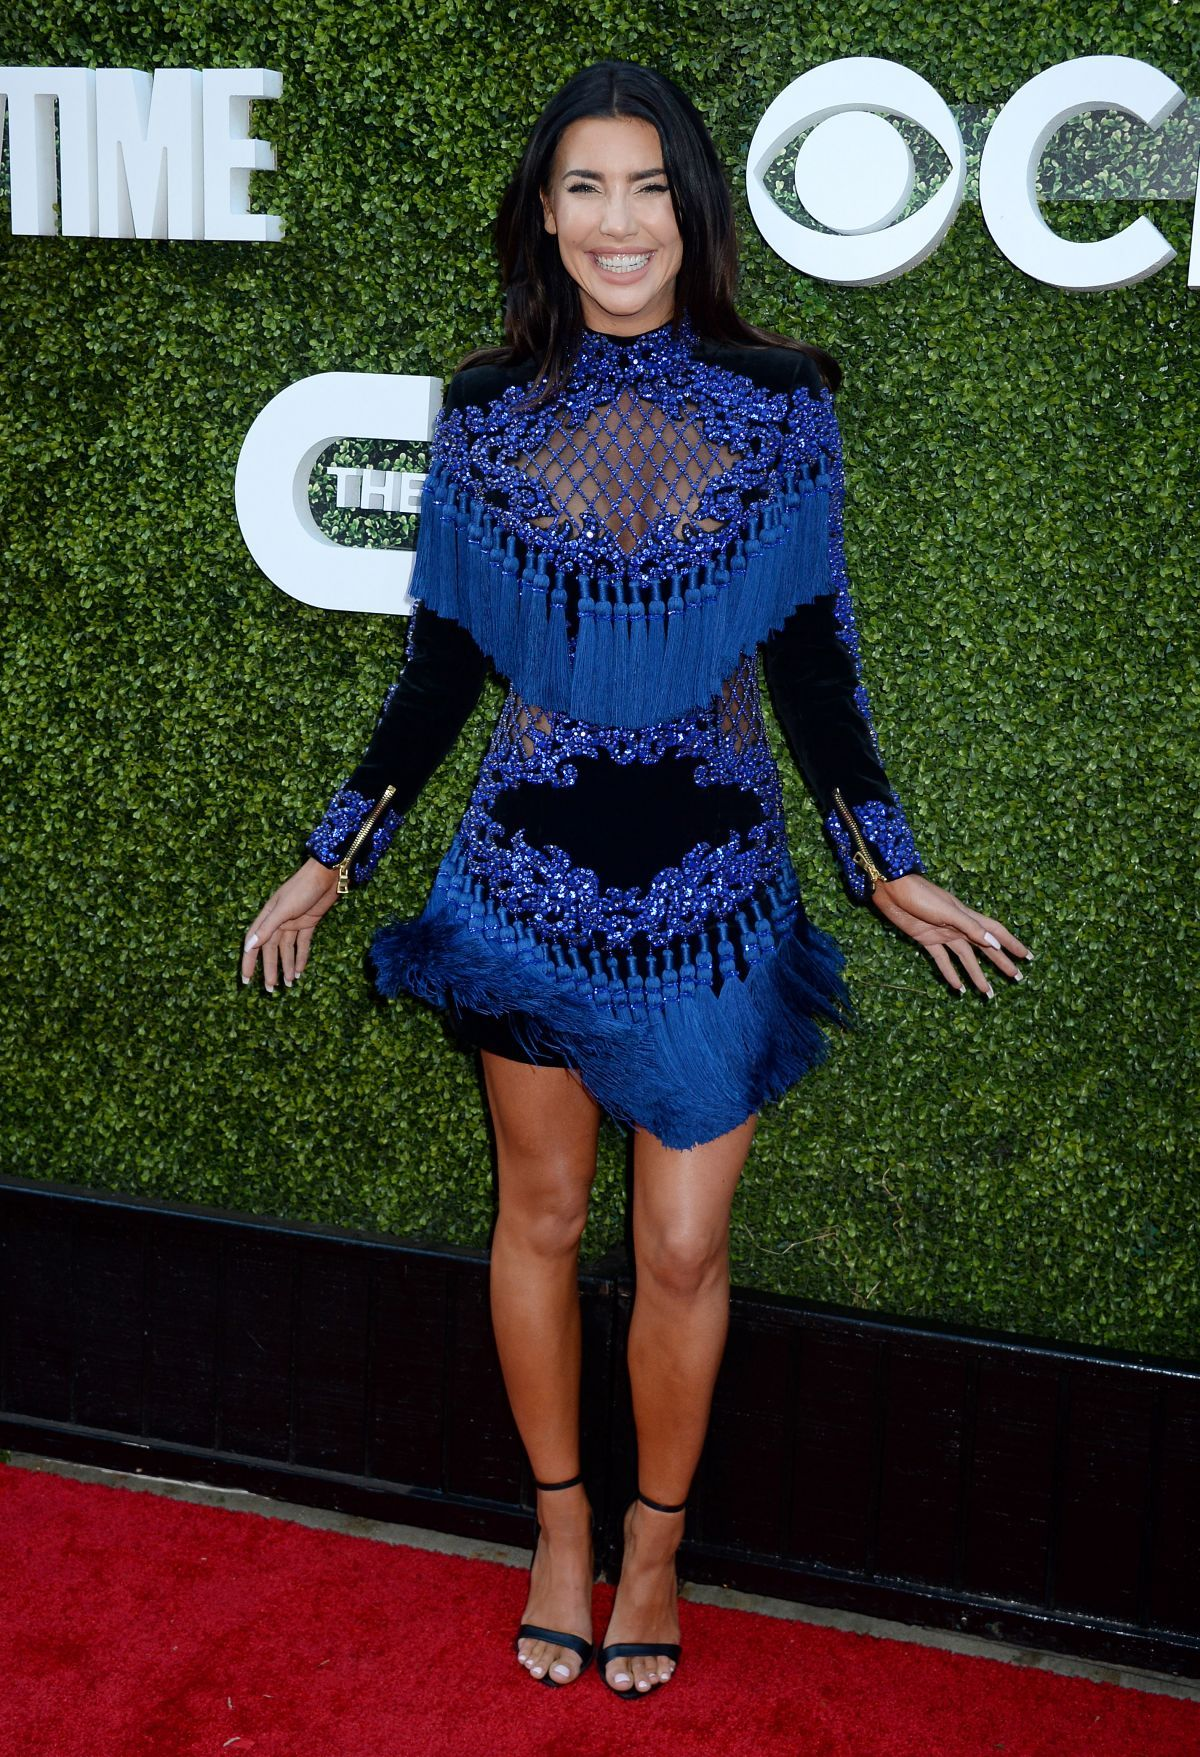 a8fb7bb9 jacqueline macinnes wood style balmain fashion blue tassel dress ...